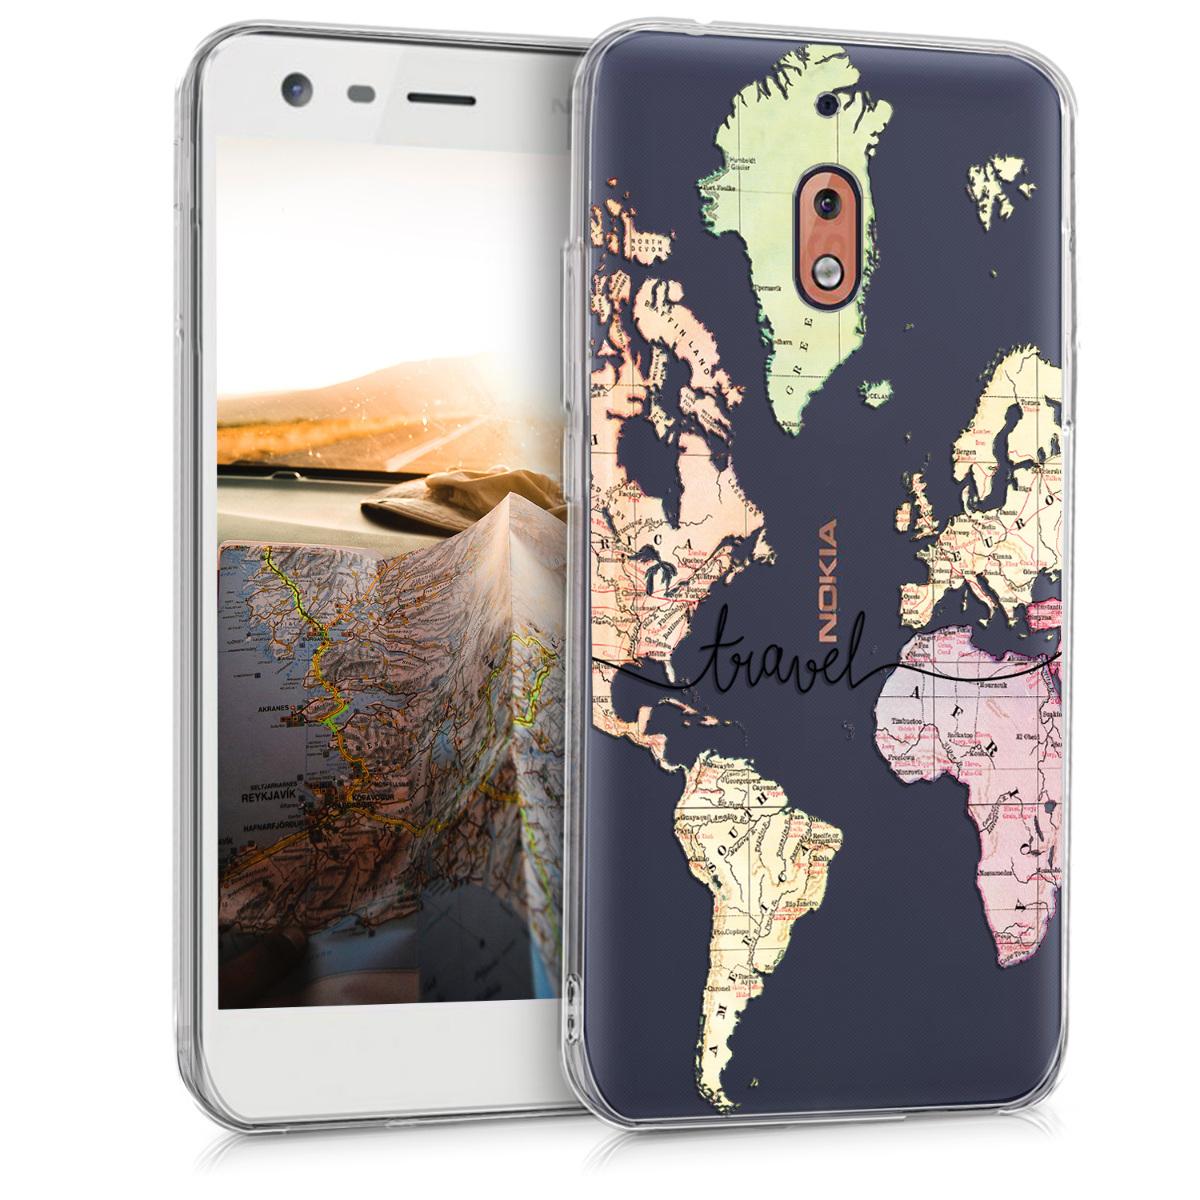 KW Θήκη Σιλικόνης Nokia 2.1  - Black / Multicolor / Transparent (45386.04)